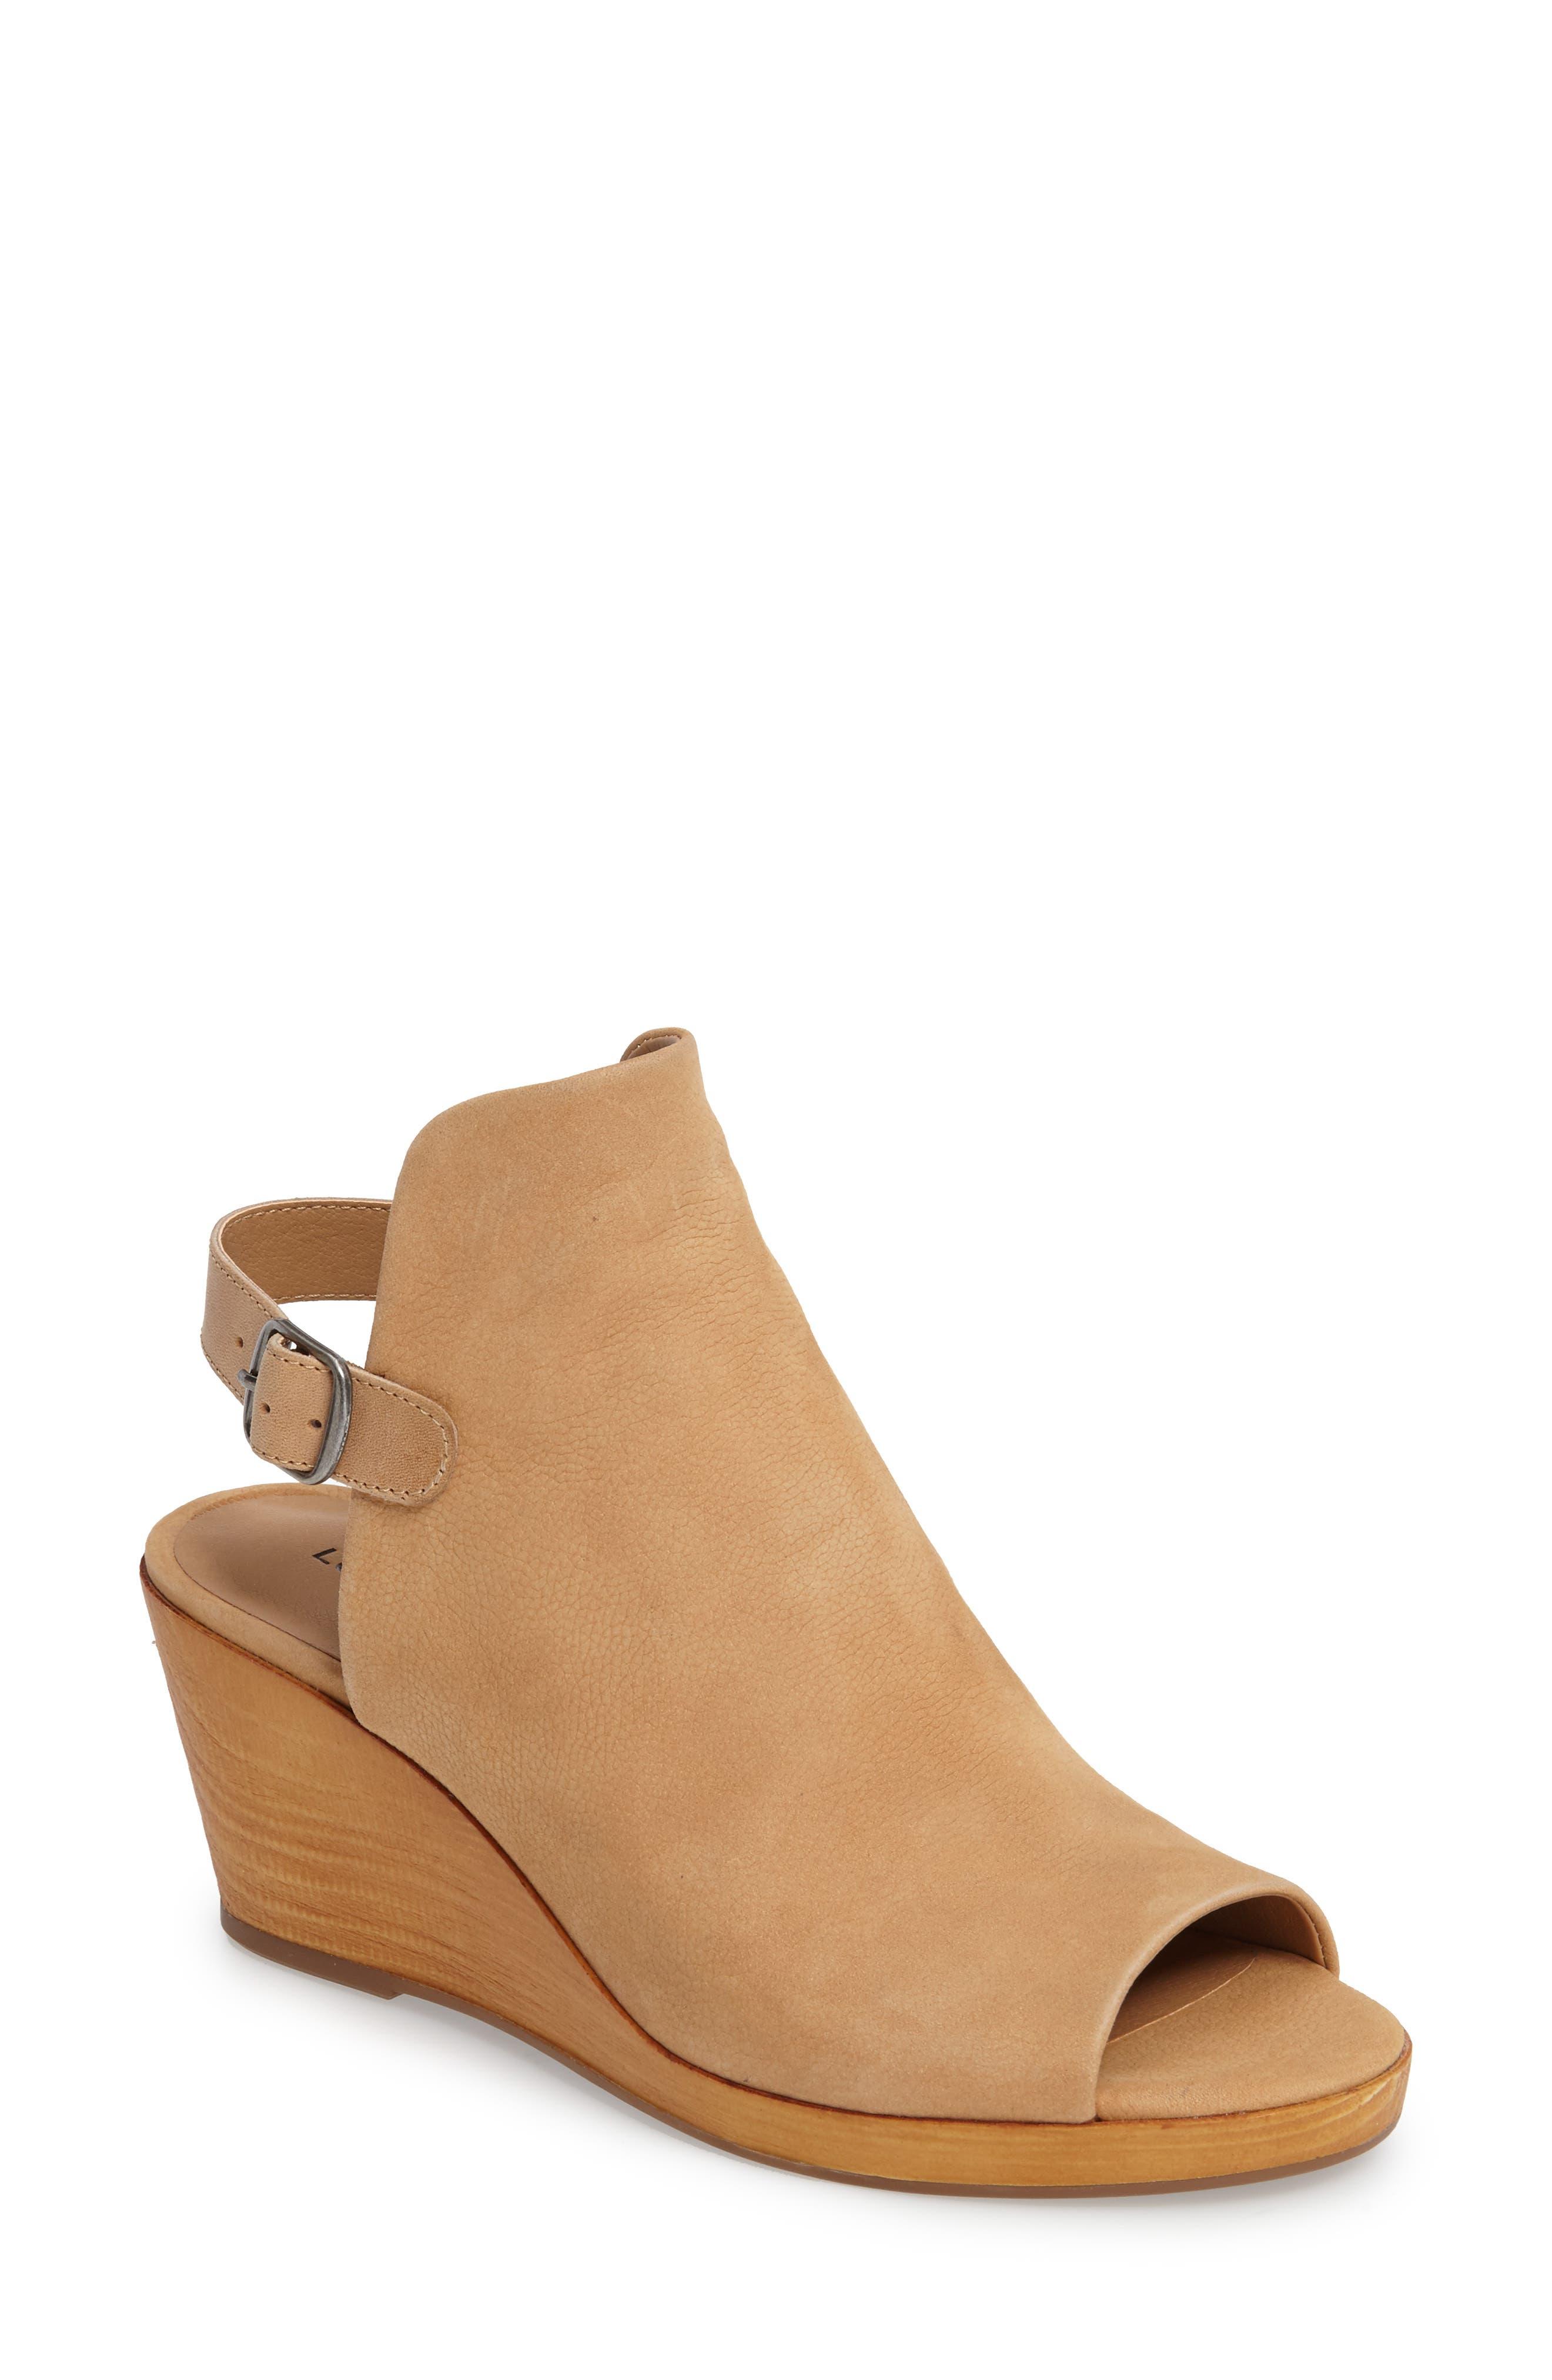 Keralin Wedge Sandal,                             Main thumbnail 1, color,                             Glazed Leather